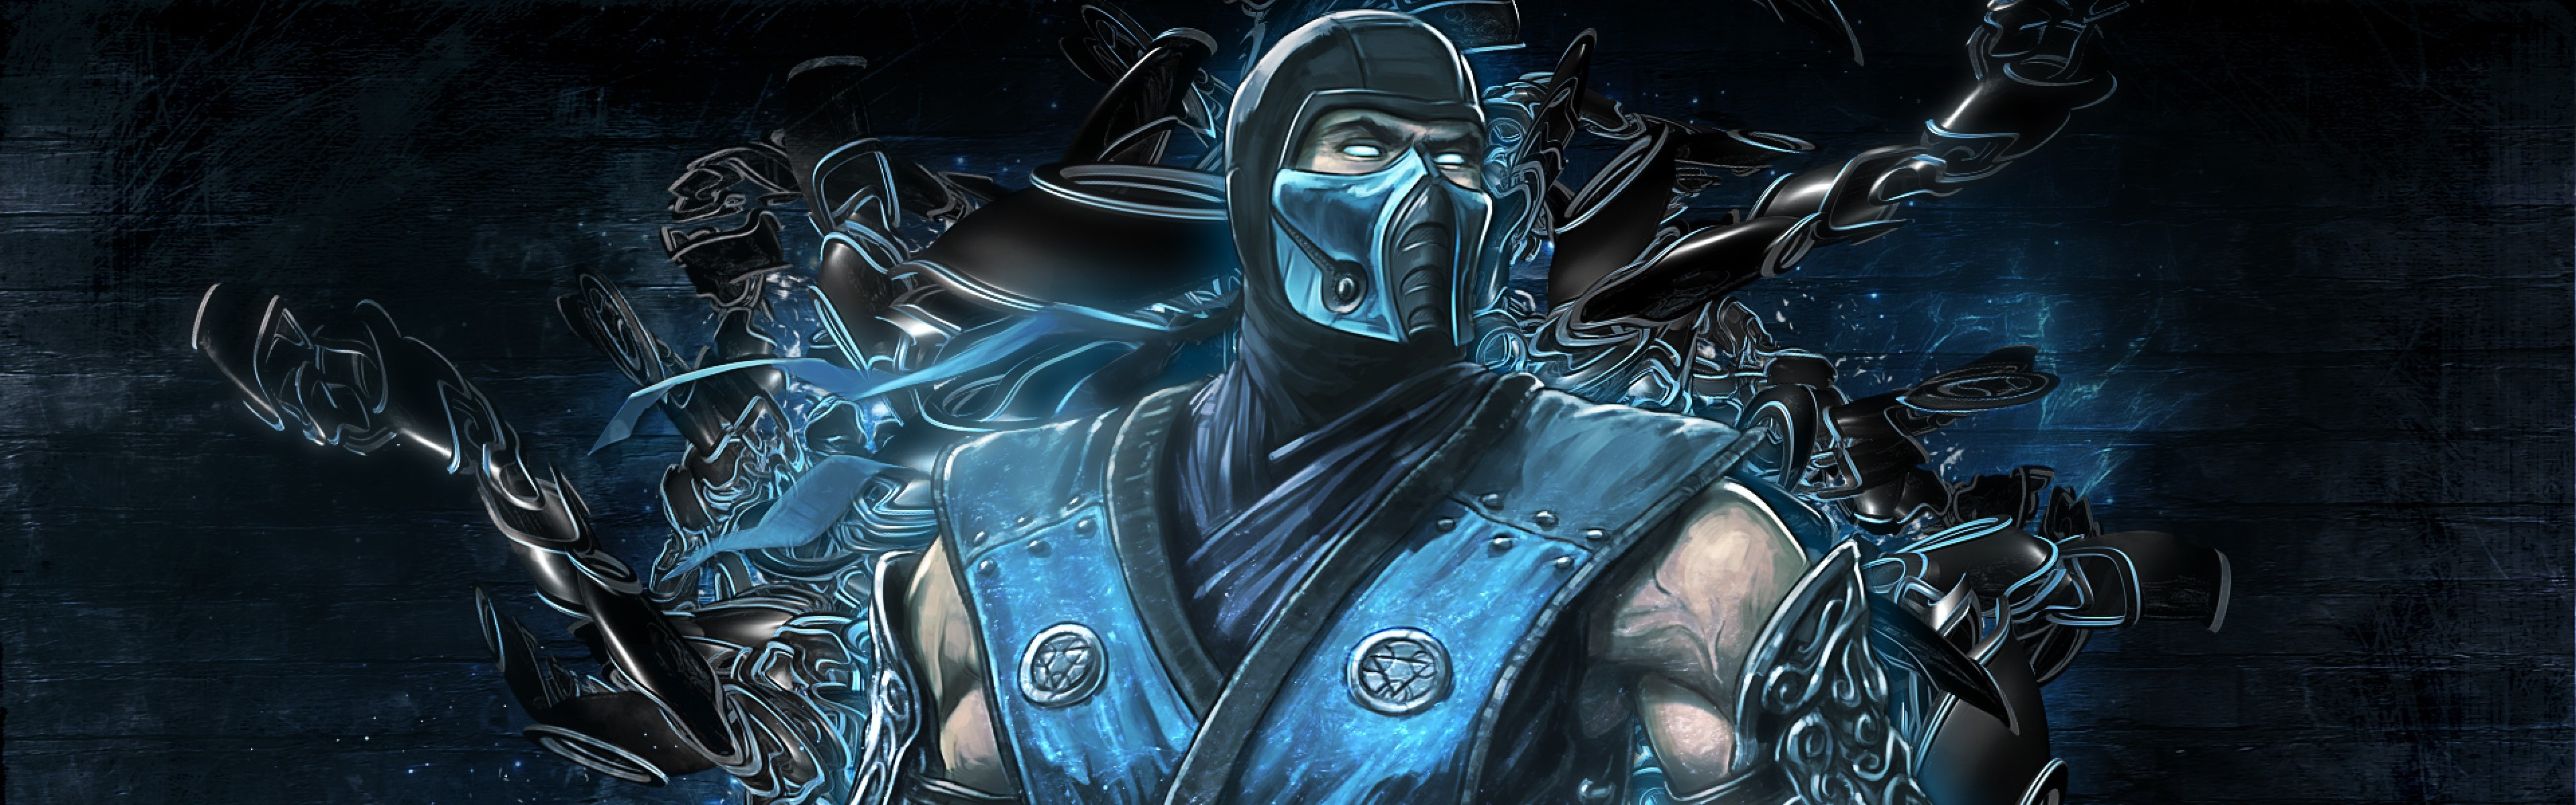 Mortal Kombat Sub Zero Wallpaper : Find best latest Mortal Kombat Sub Zero  Wallpaper in HD